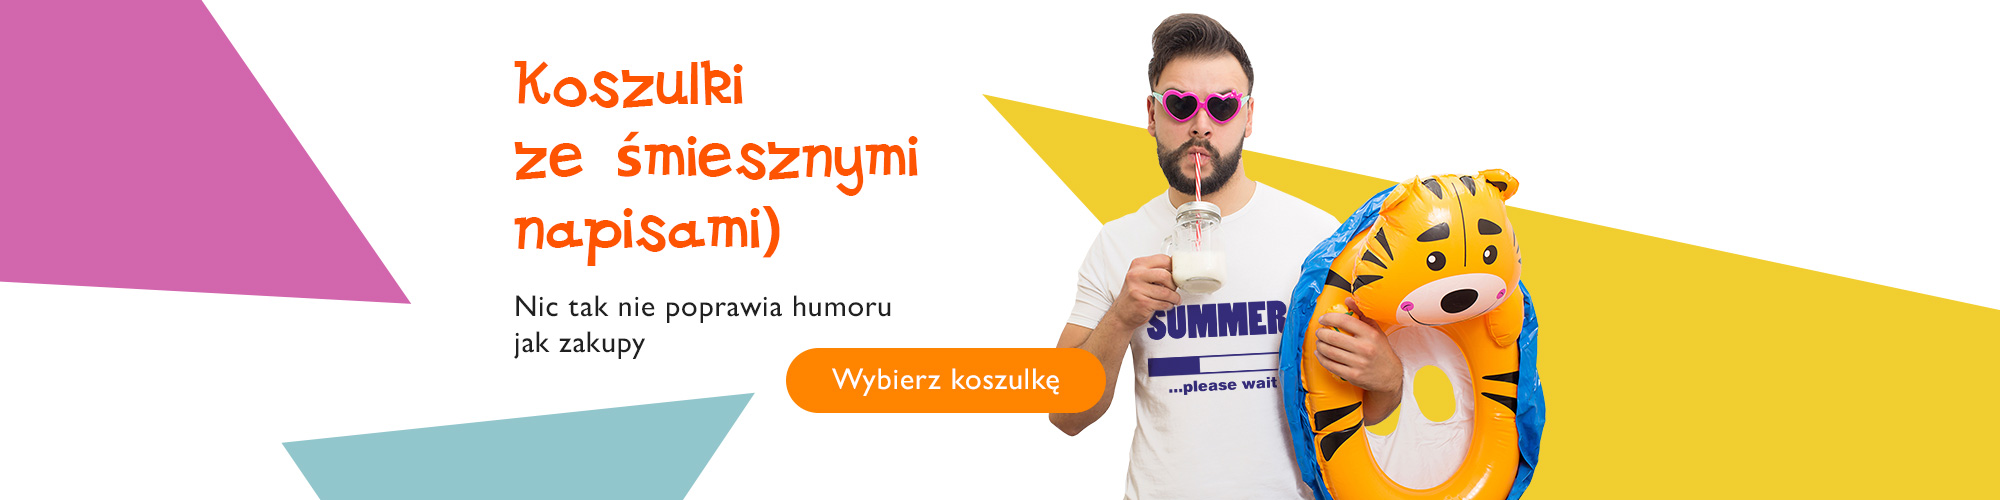 banner-smieszne-koszulki-pl